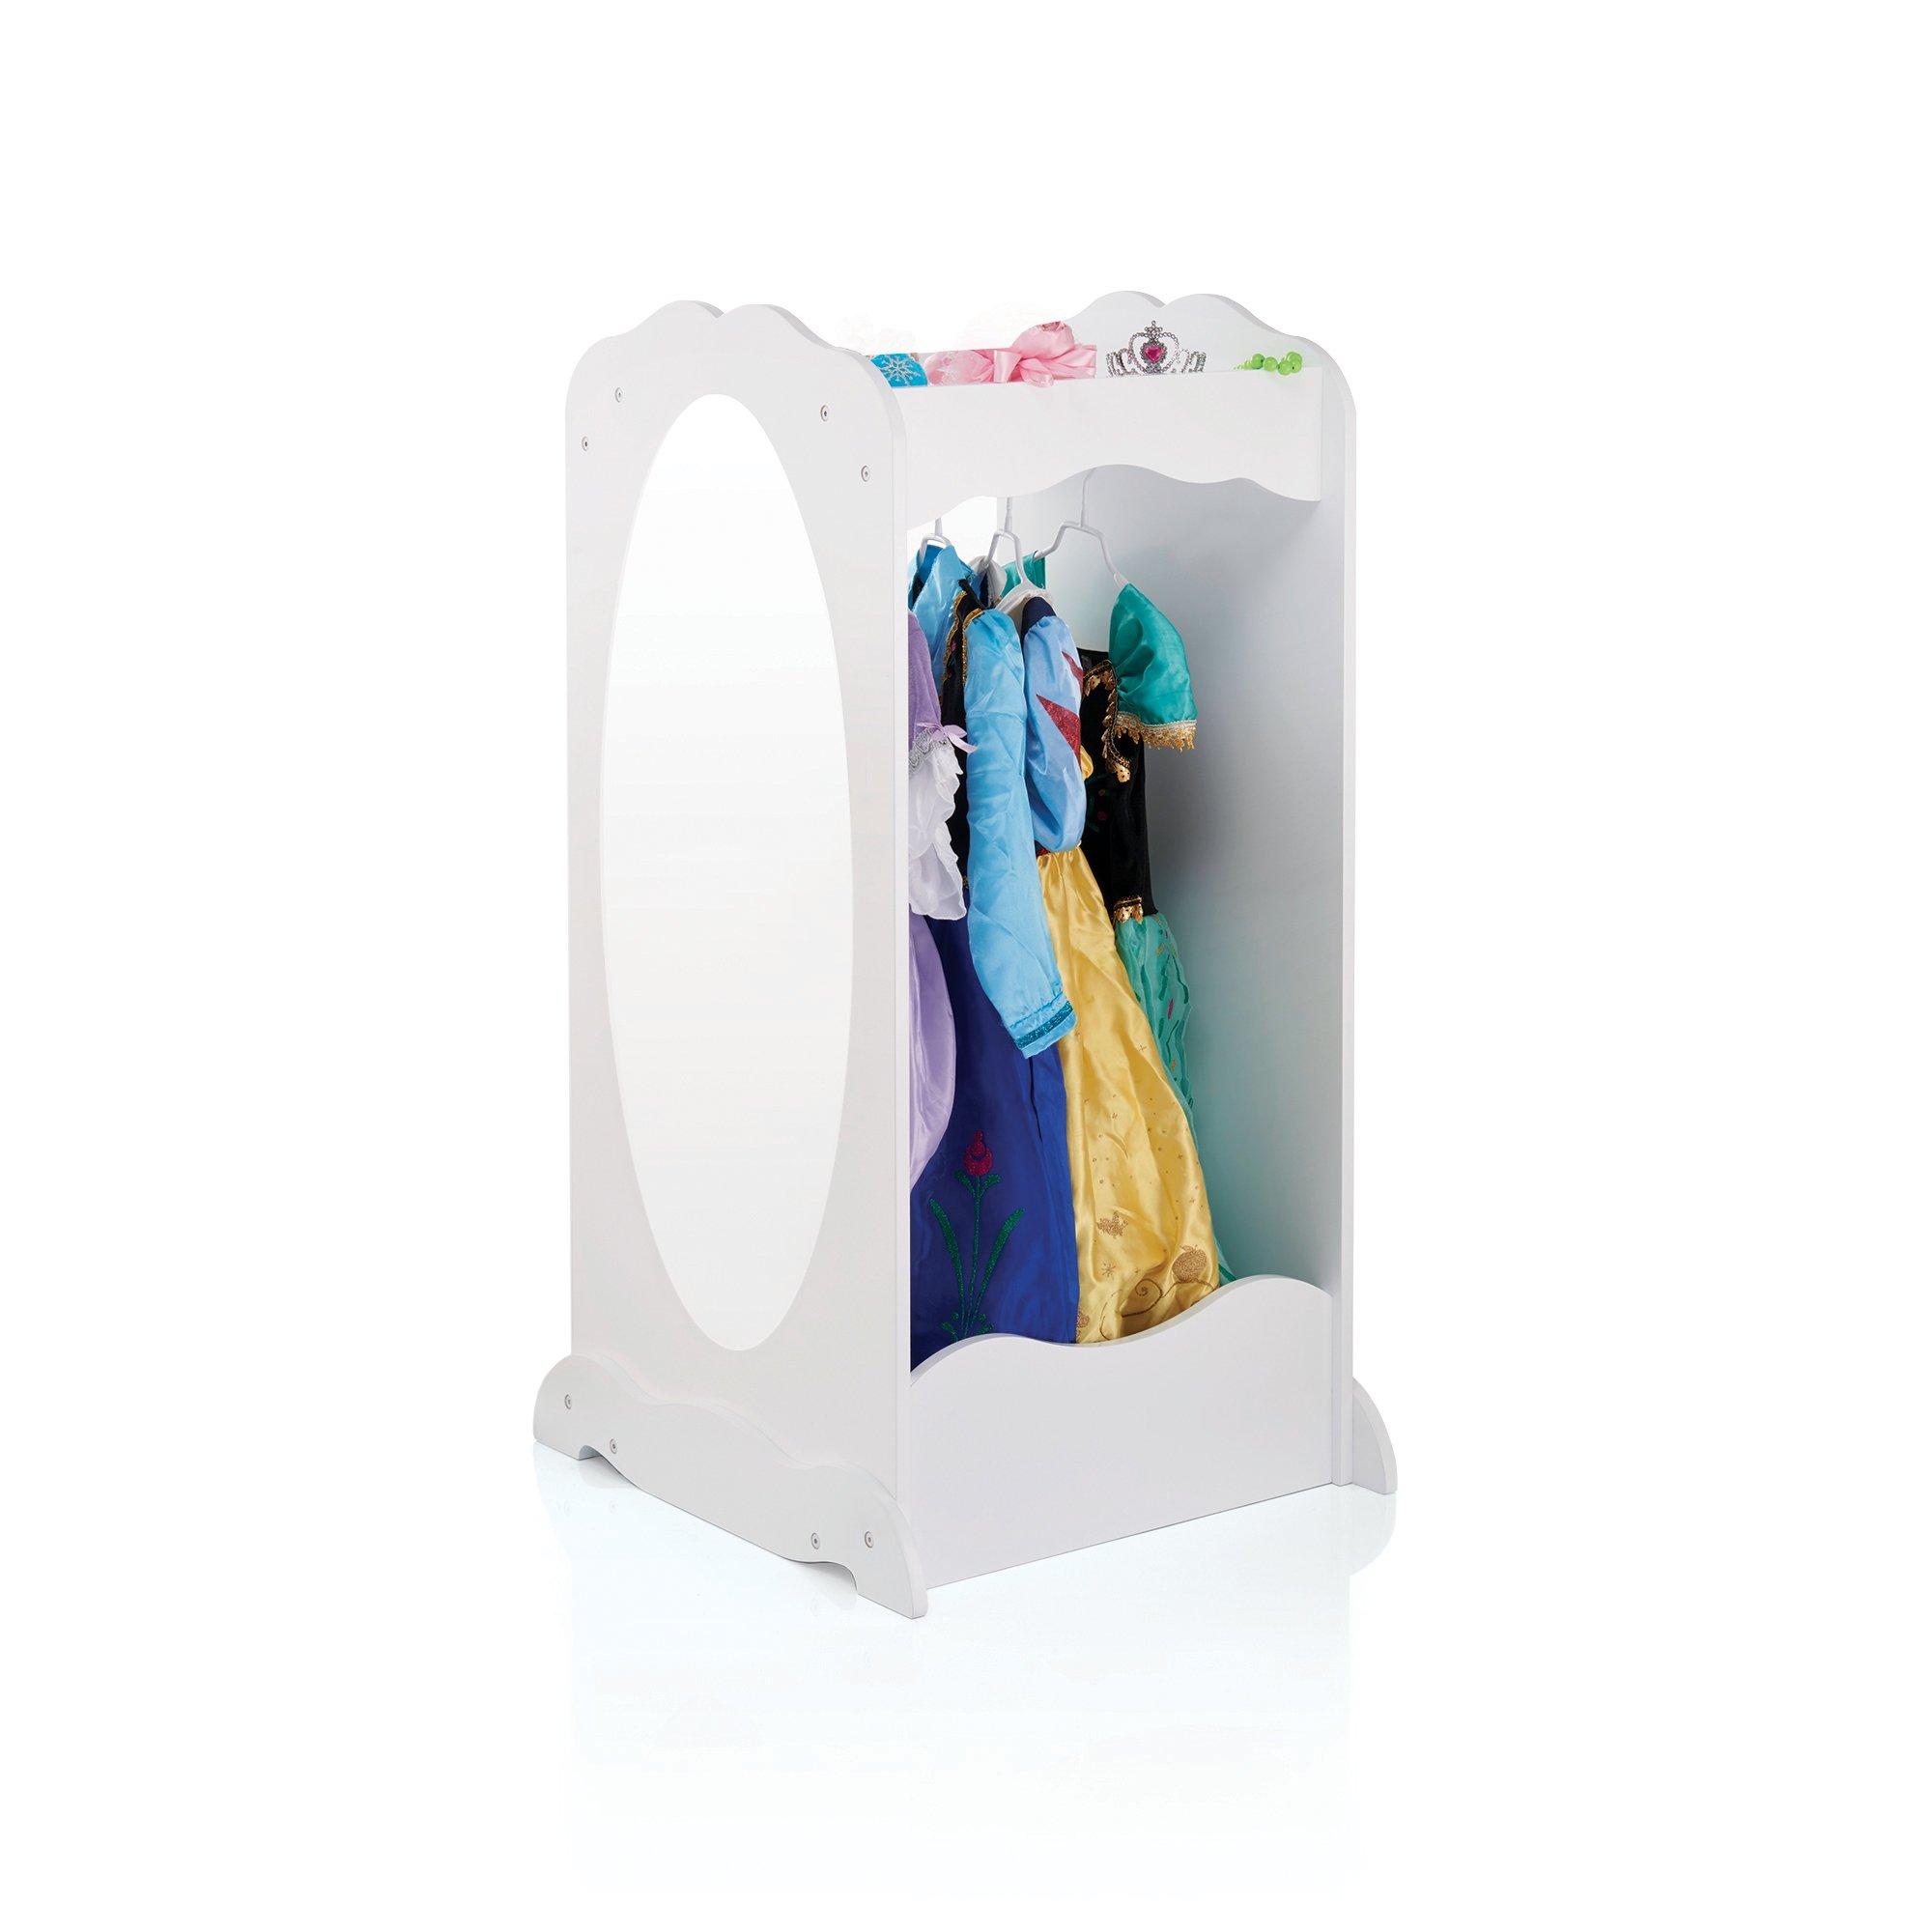 Guidecraft Dress Up Center with Mirror White - Armoire, Dresser Kids' Furniture